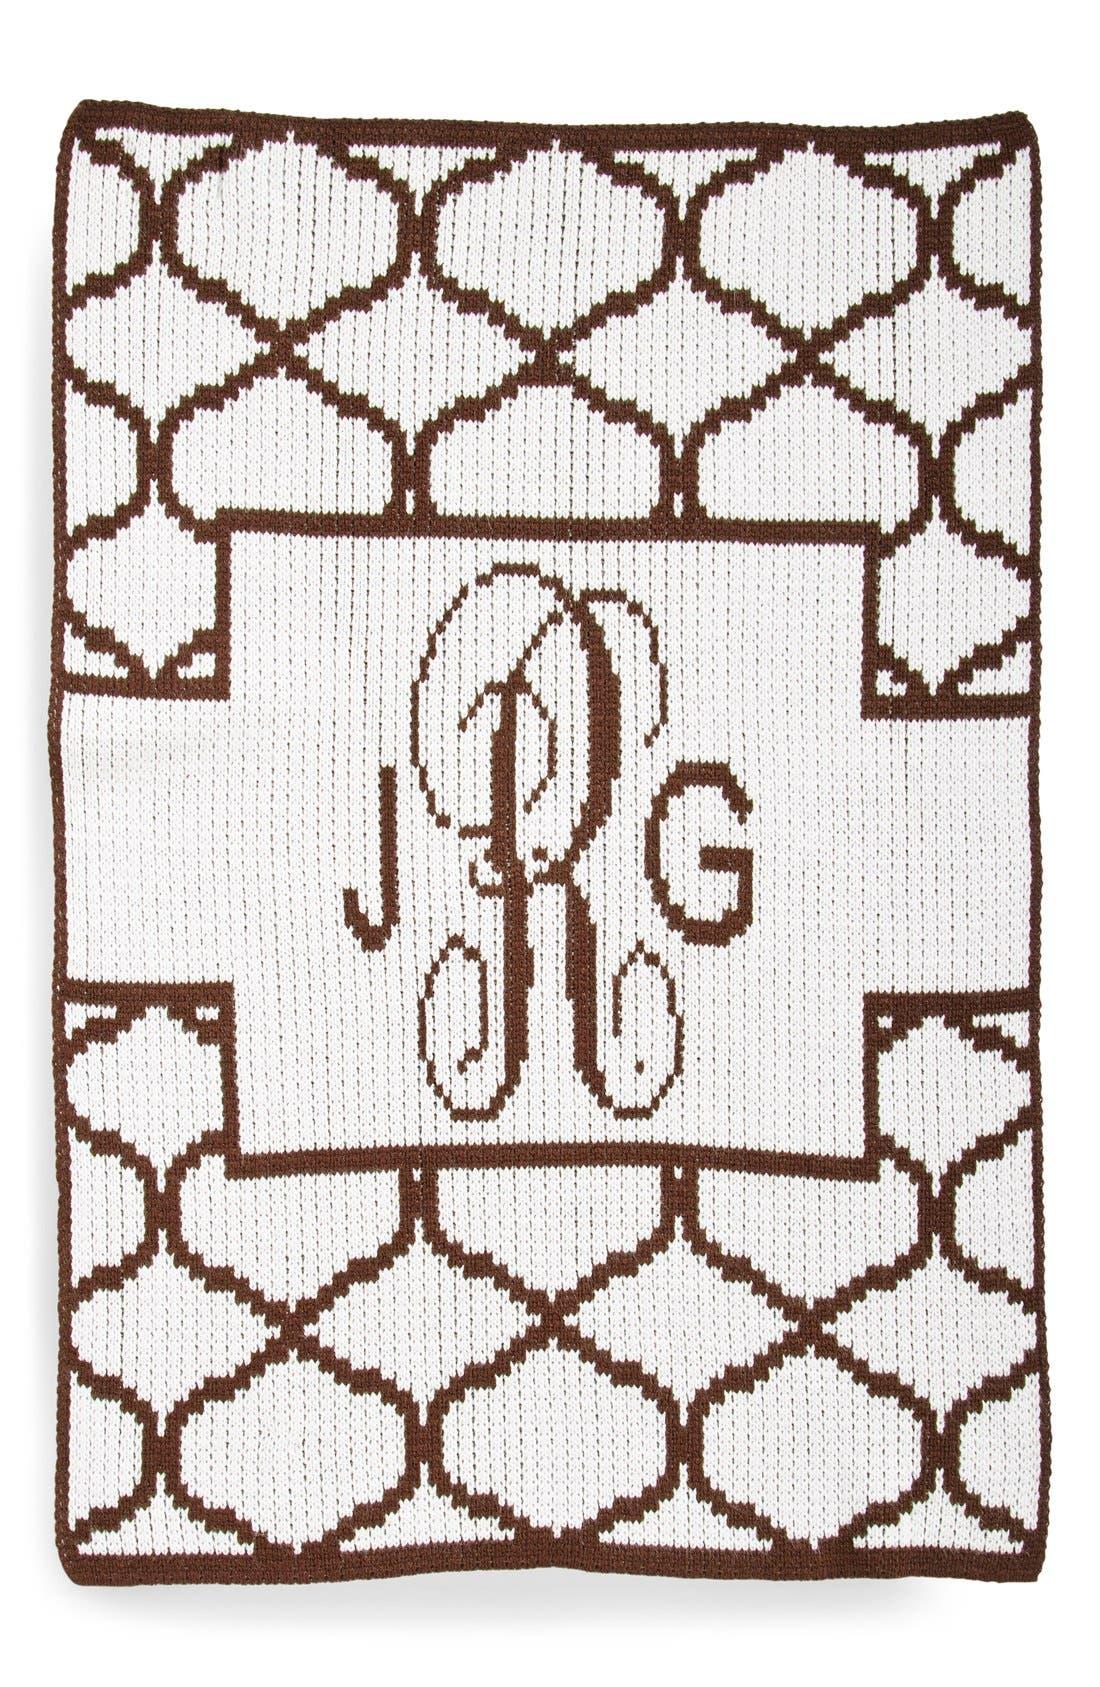 Lattice Personalized Blanket,                         Main,                         color, White/ Brown